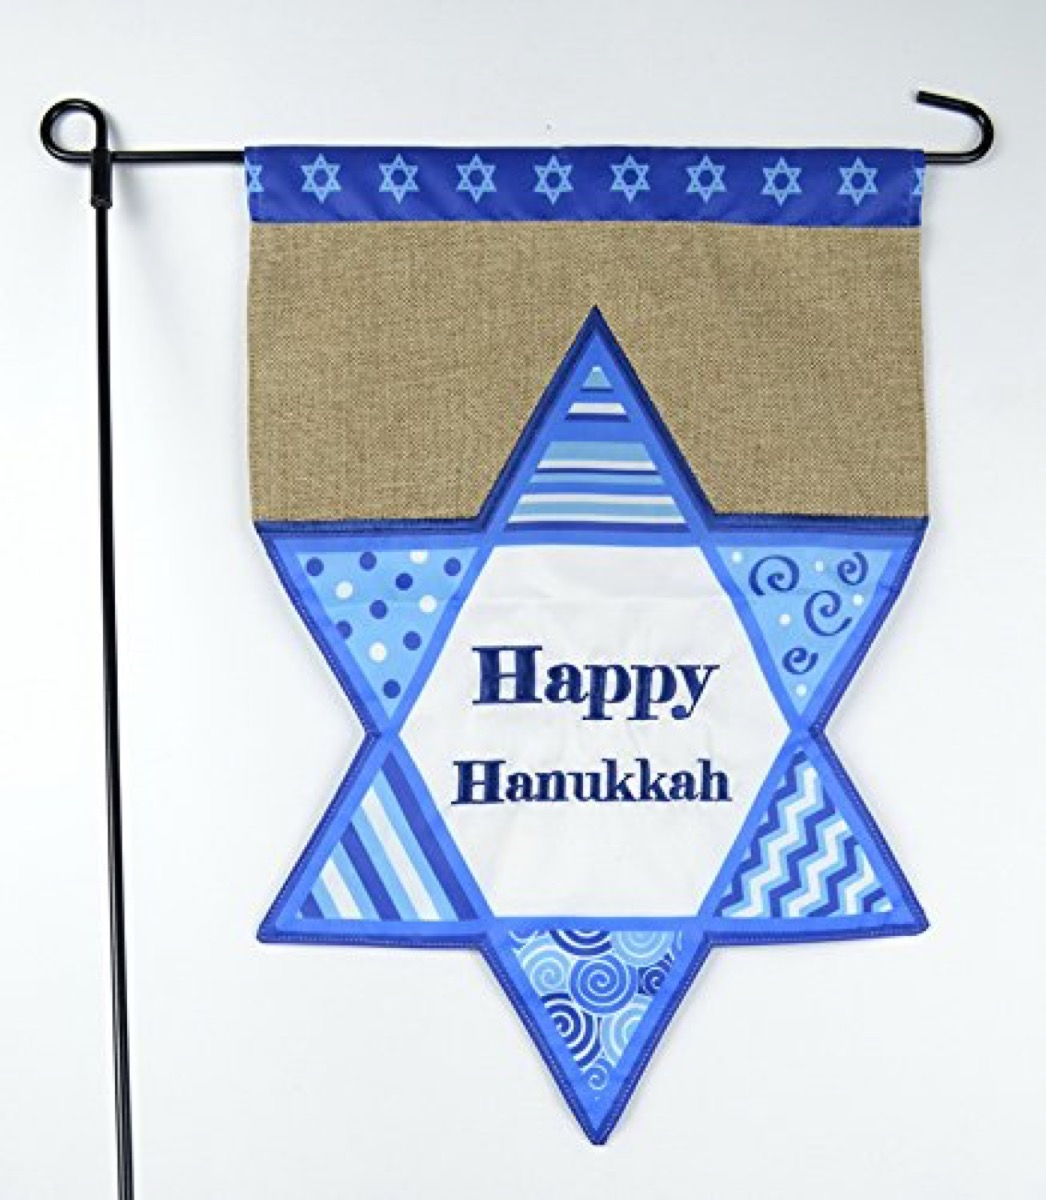 star of david garden flag on black spike, hanukkah decorations